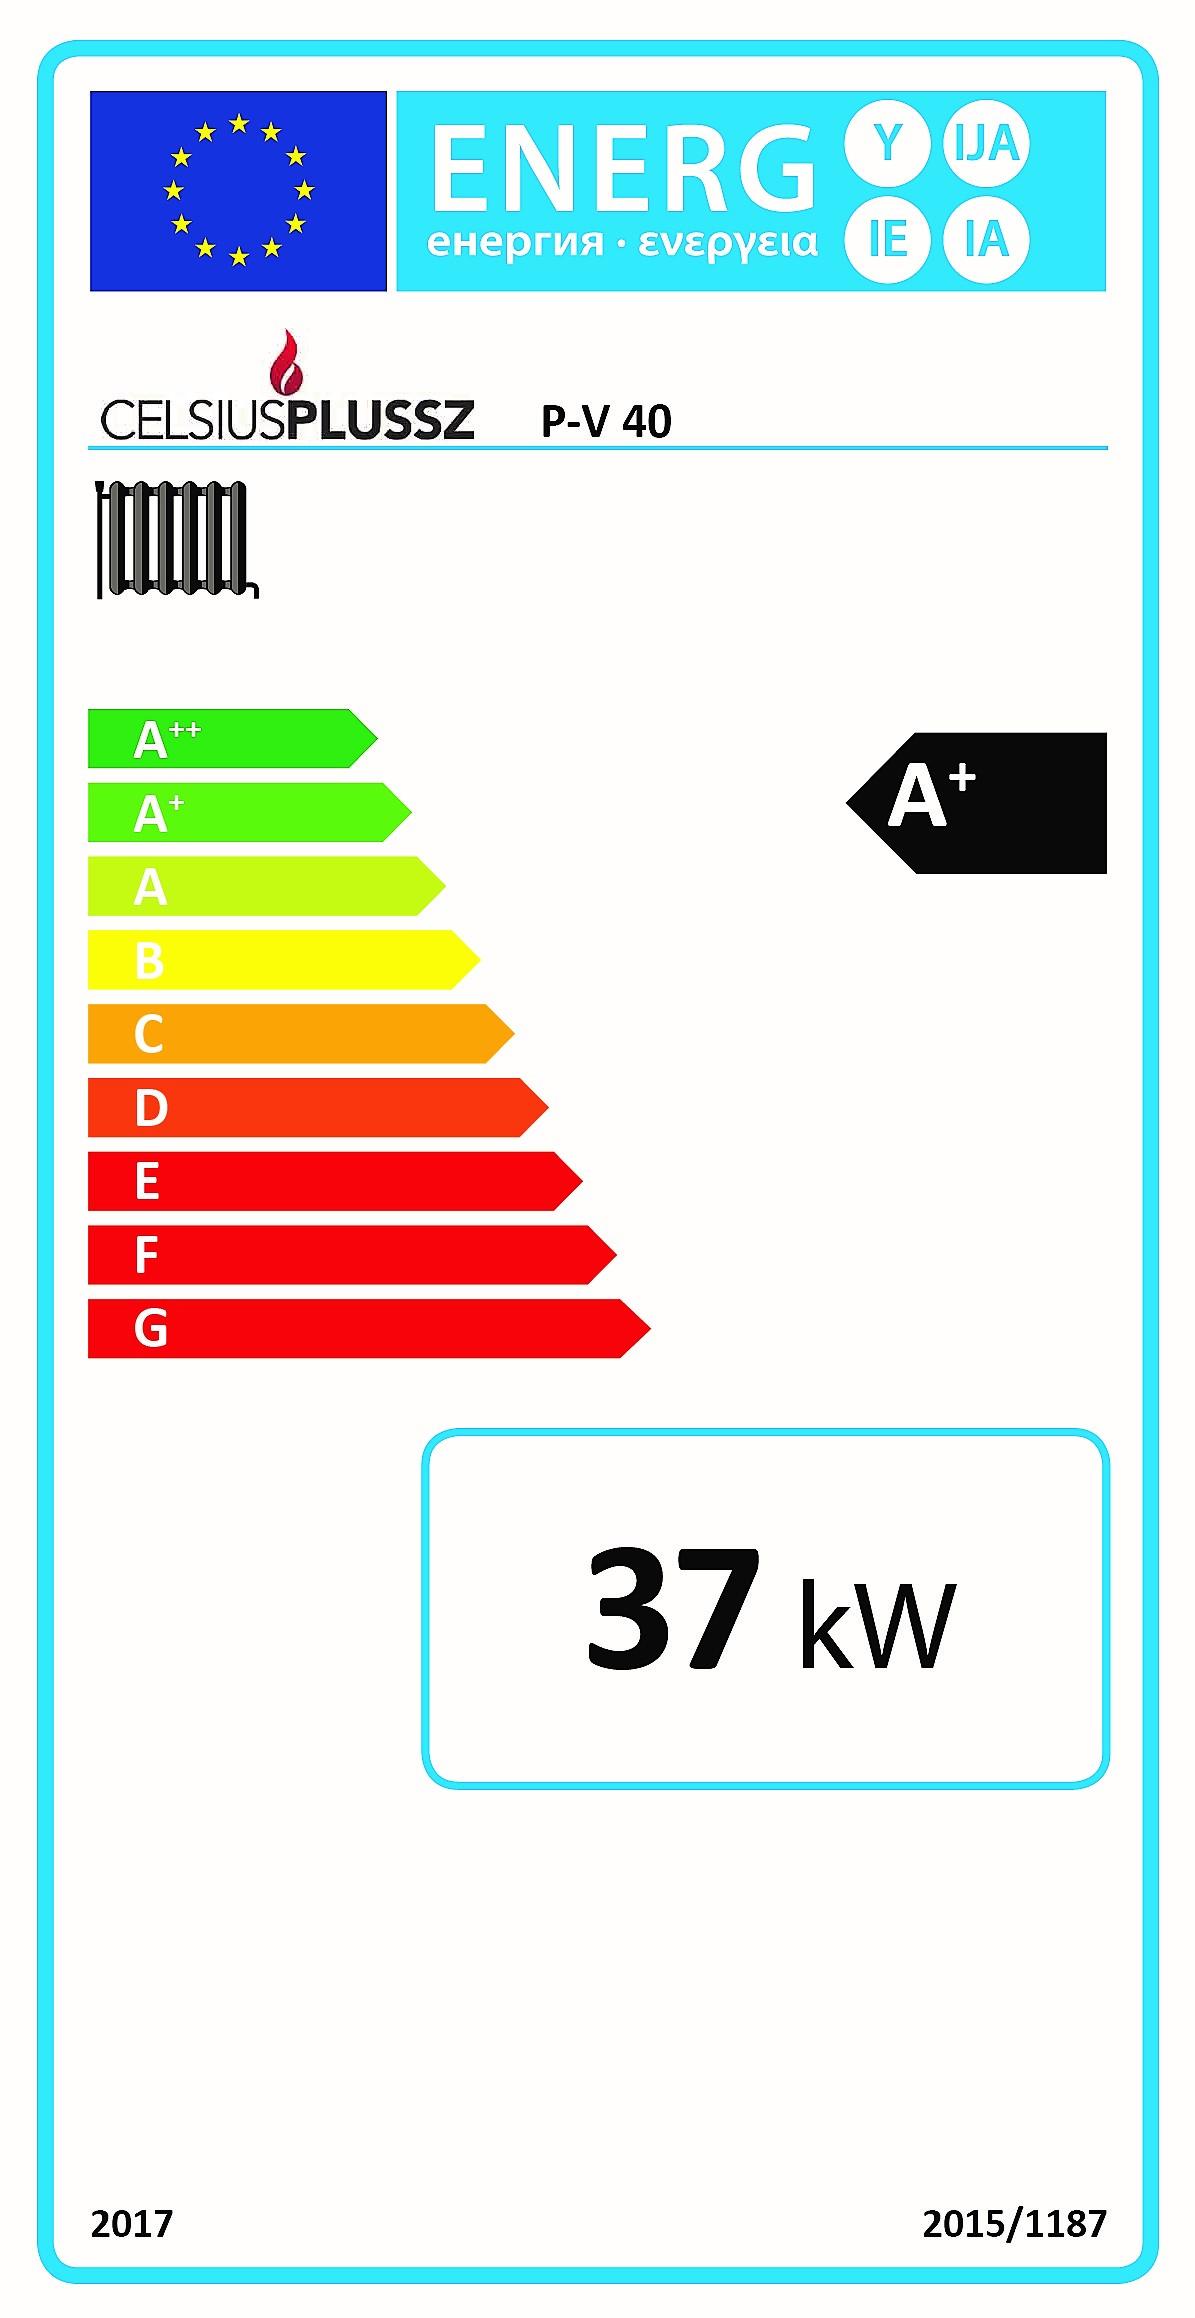 Celsius P-V 40 energiacímke